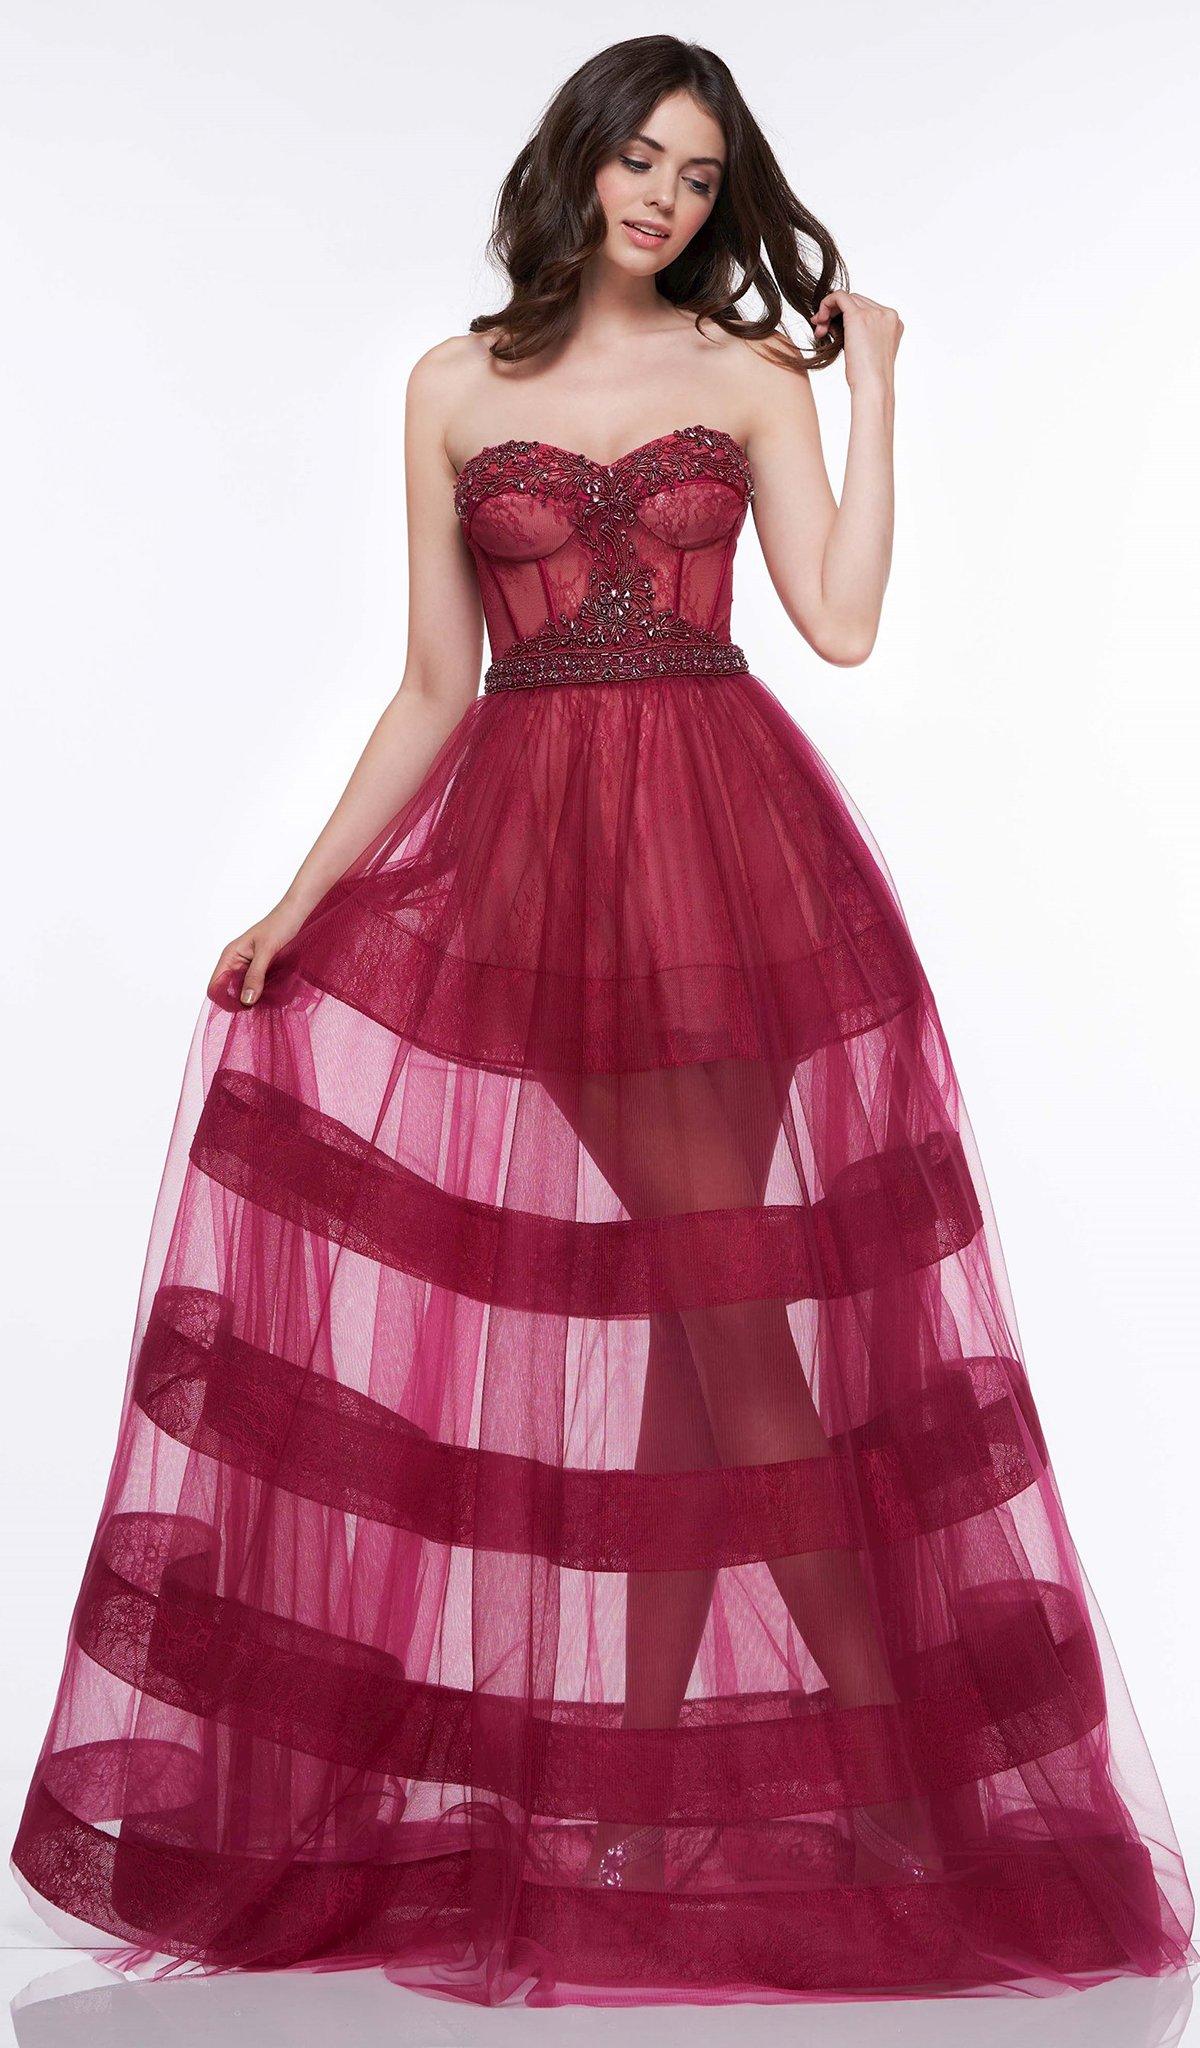 Colors Dress - 2108 Beaded Sweetheart Sheer Ballgown